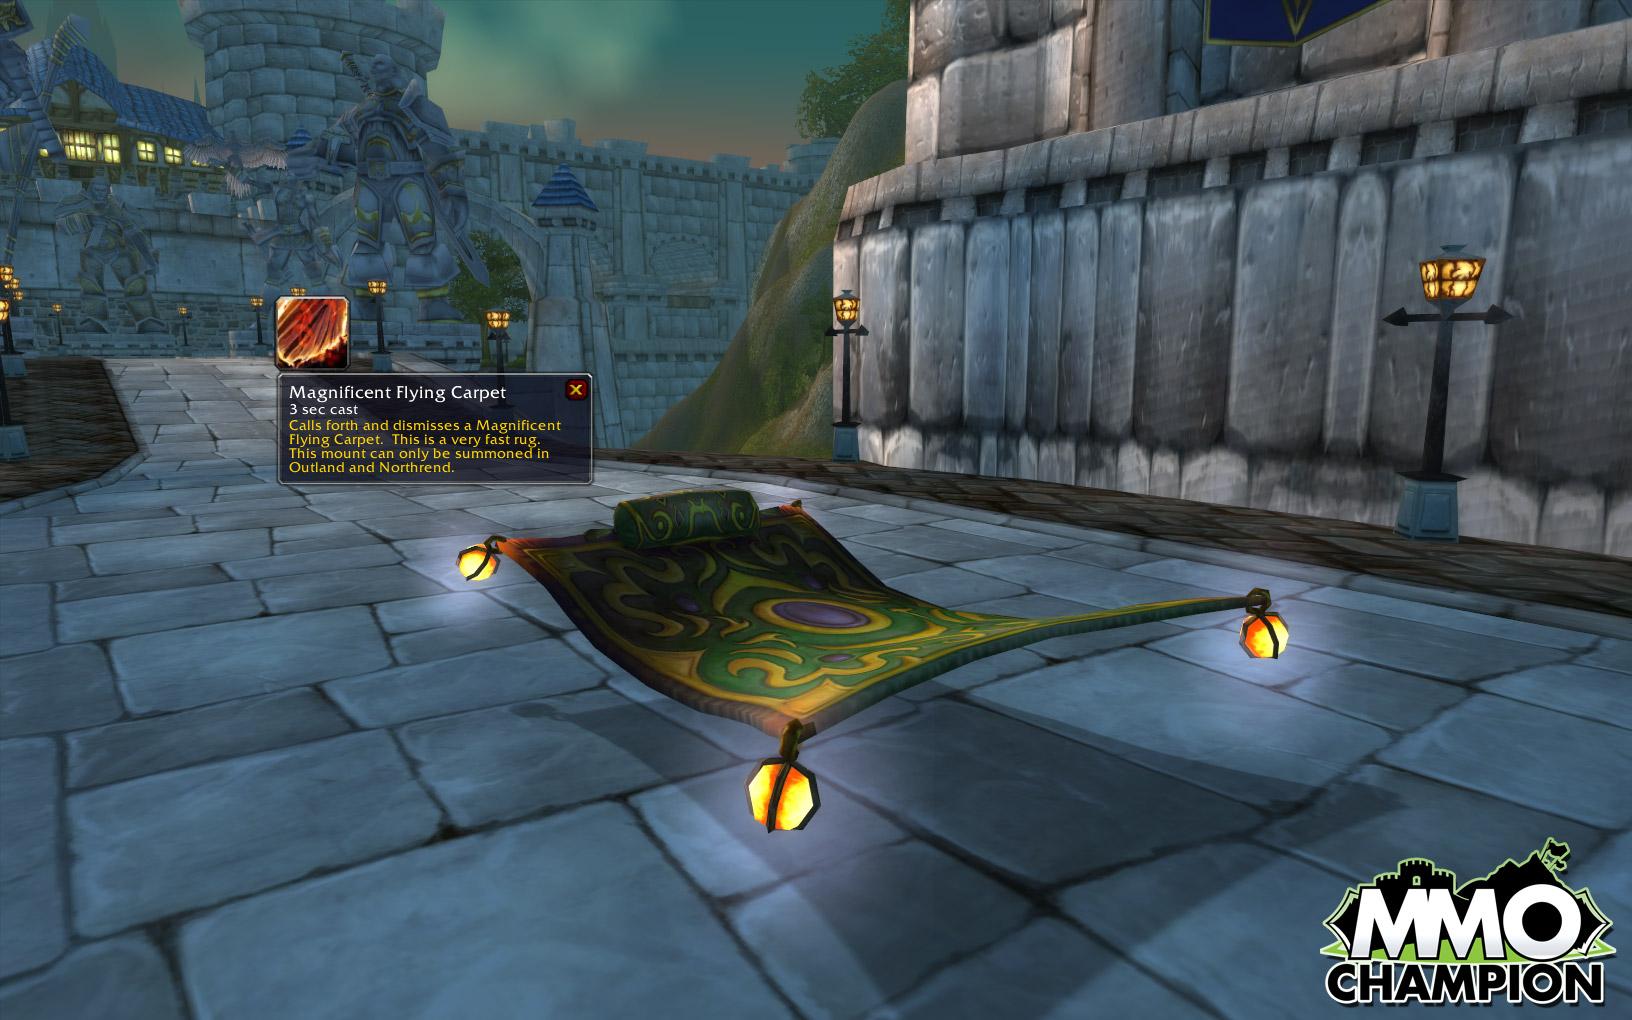 Wotlk Mounts Eye Of Eternity Update